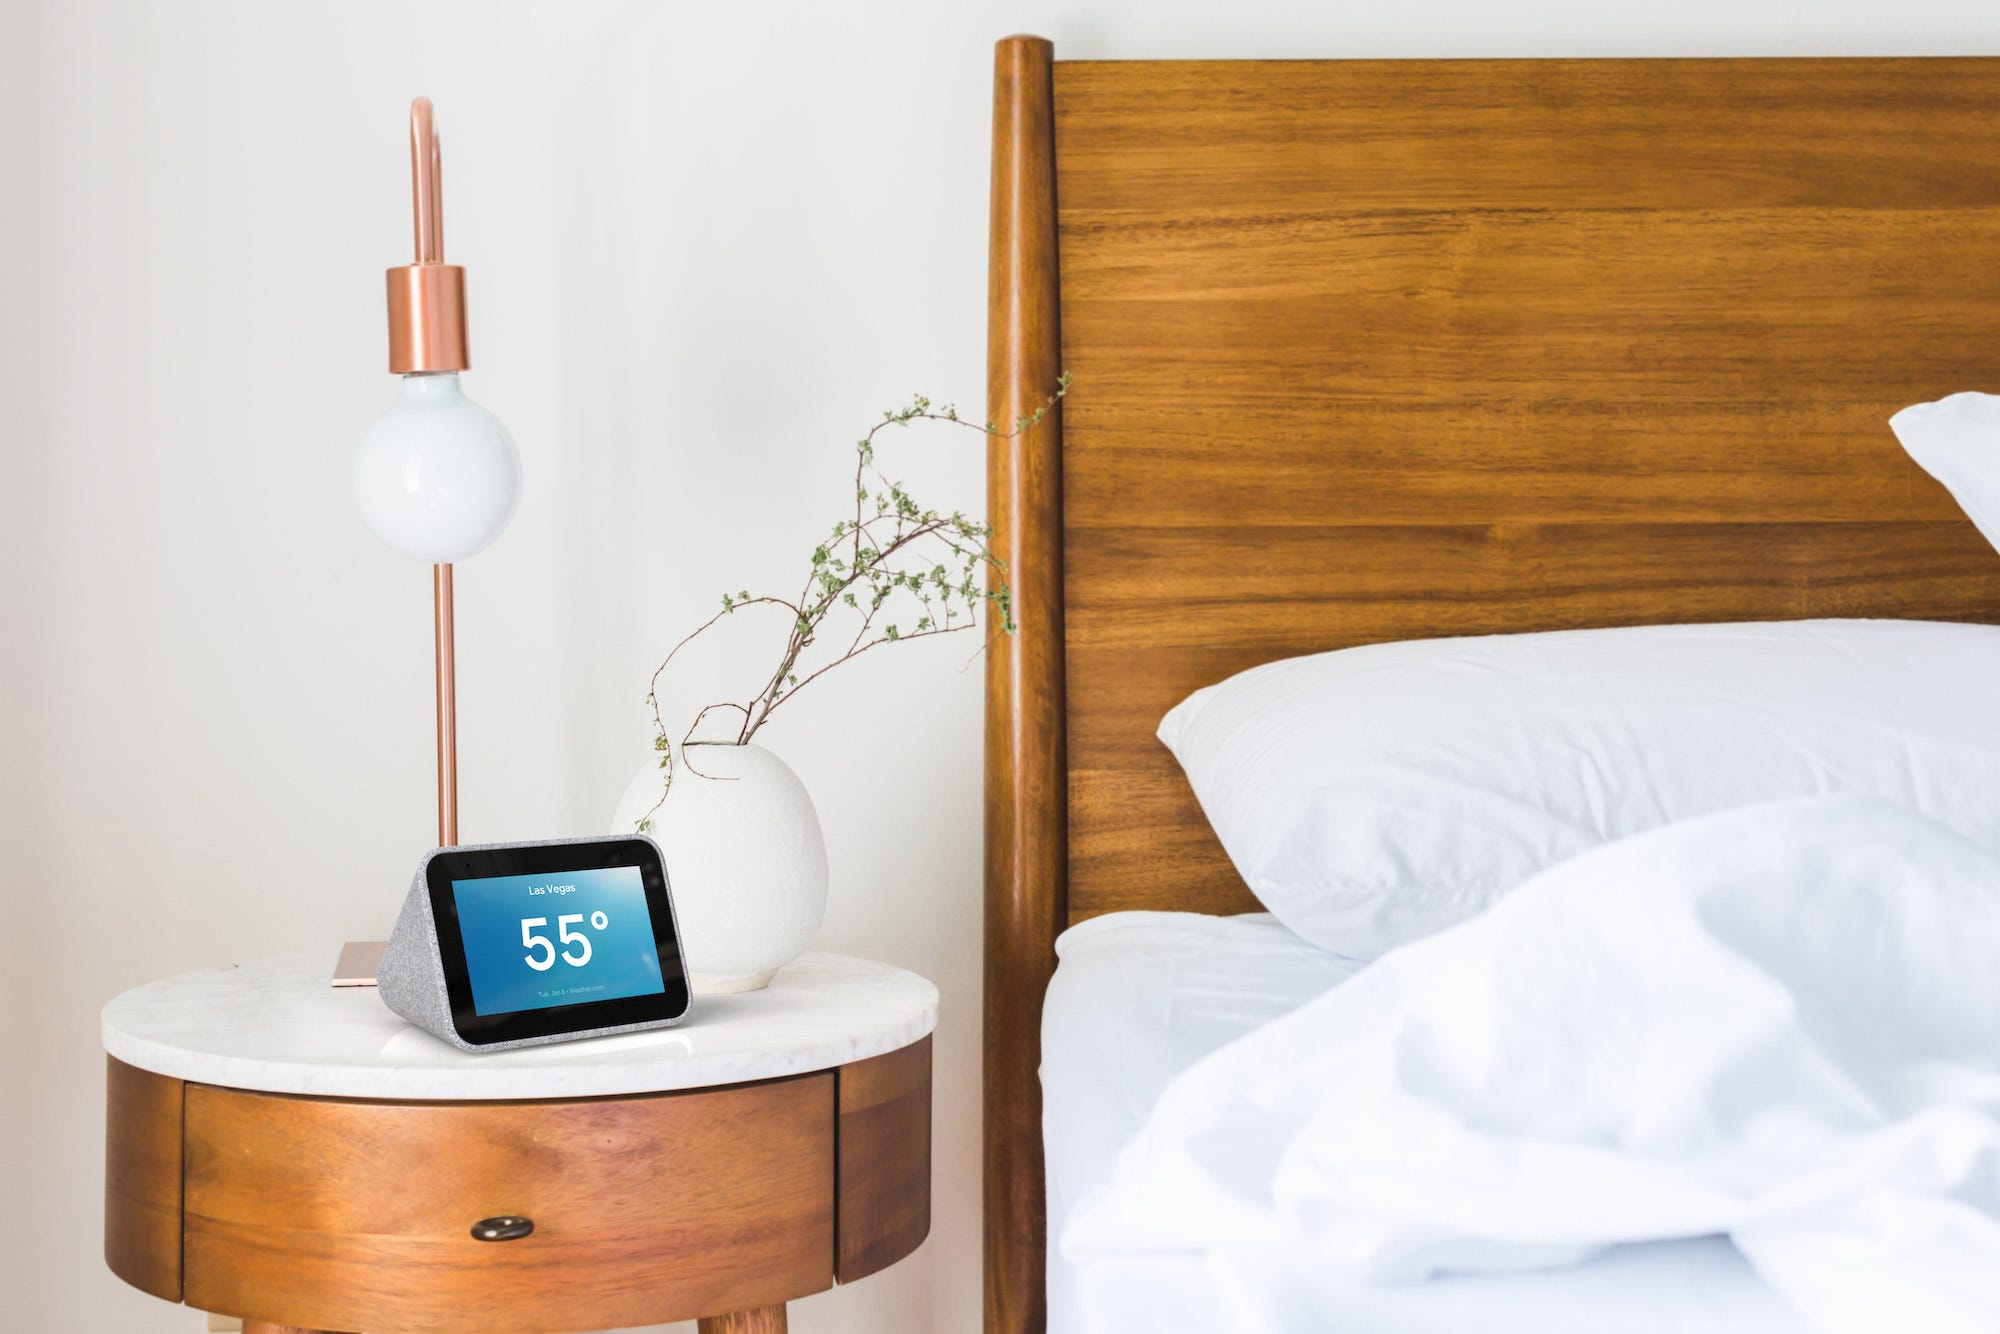 Lenovo smart clock. умные часы с дисплеем